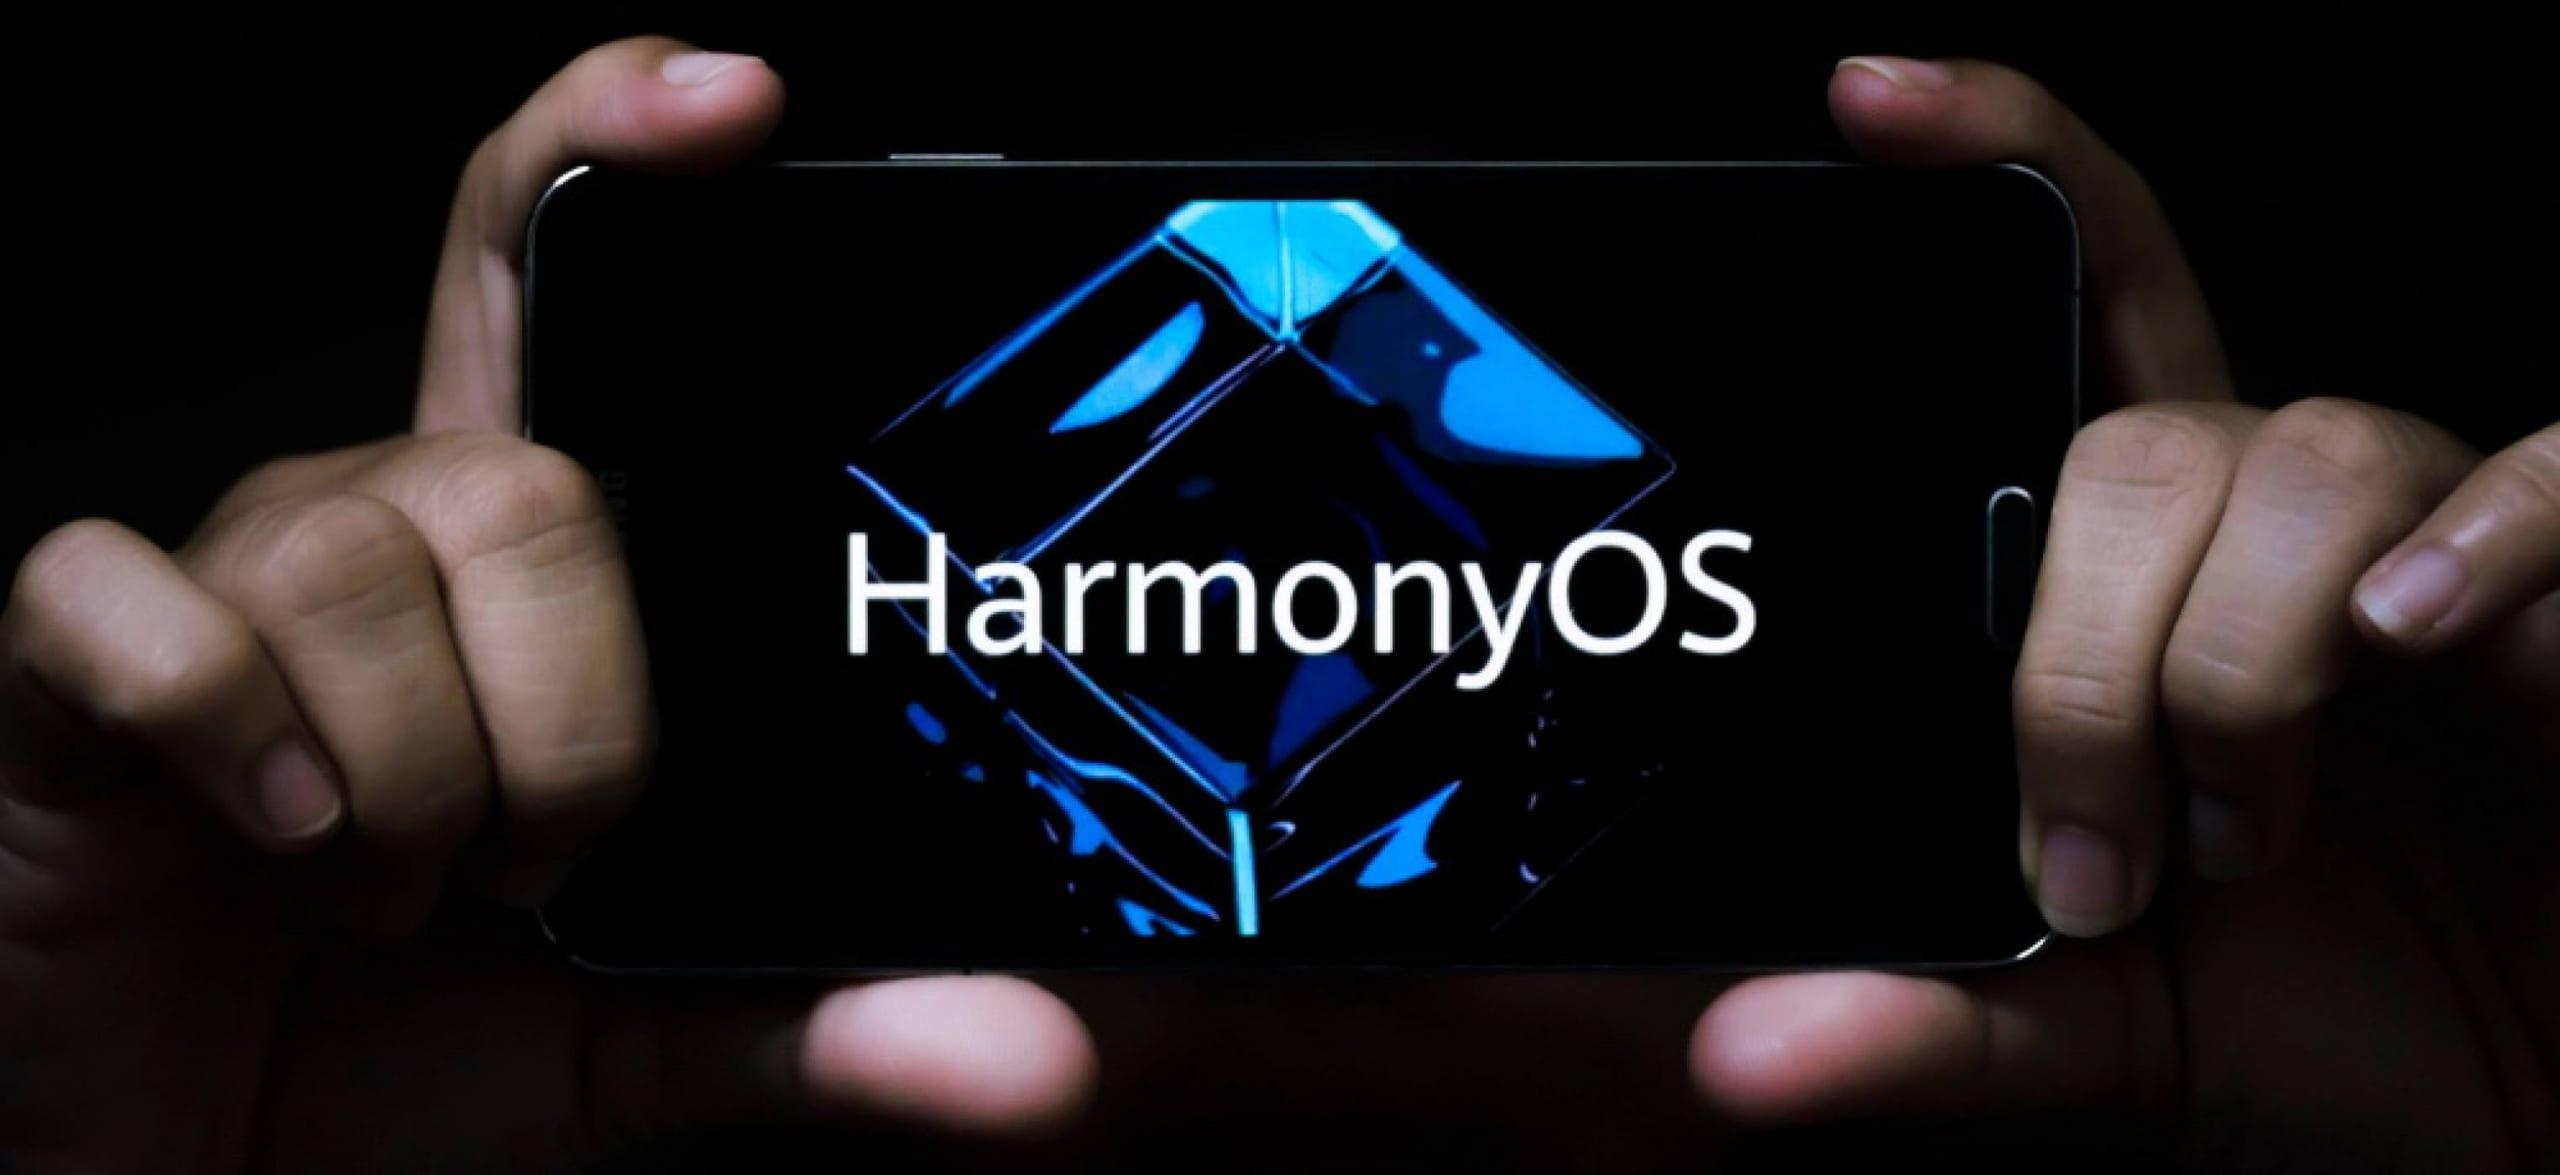 Huawei sta per distribuire il suo sistema operativo, HarmonyOS